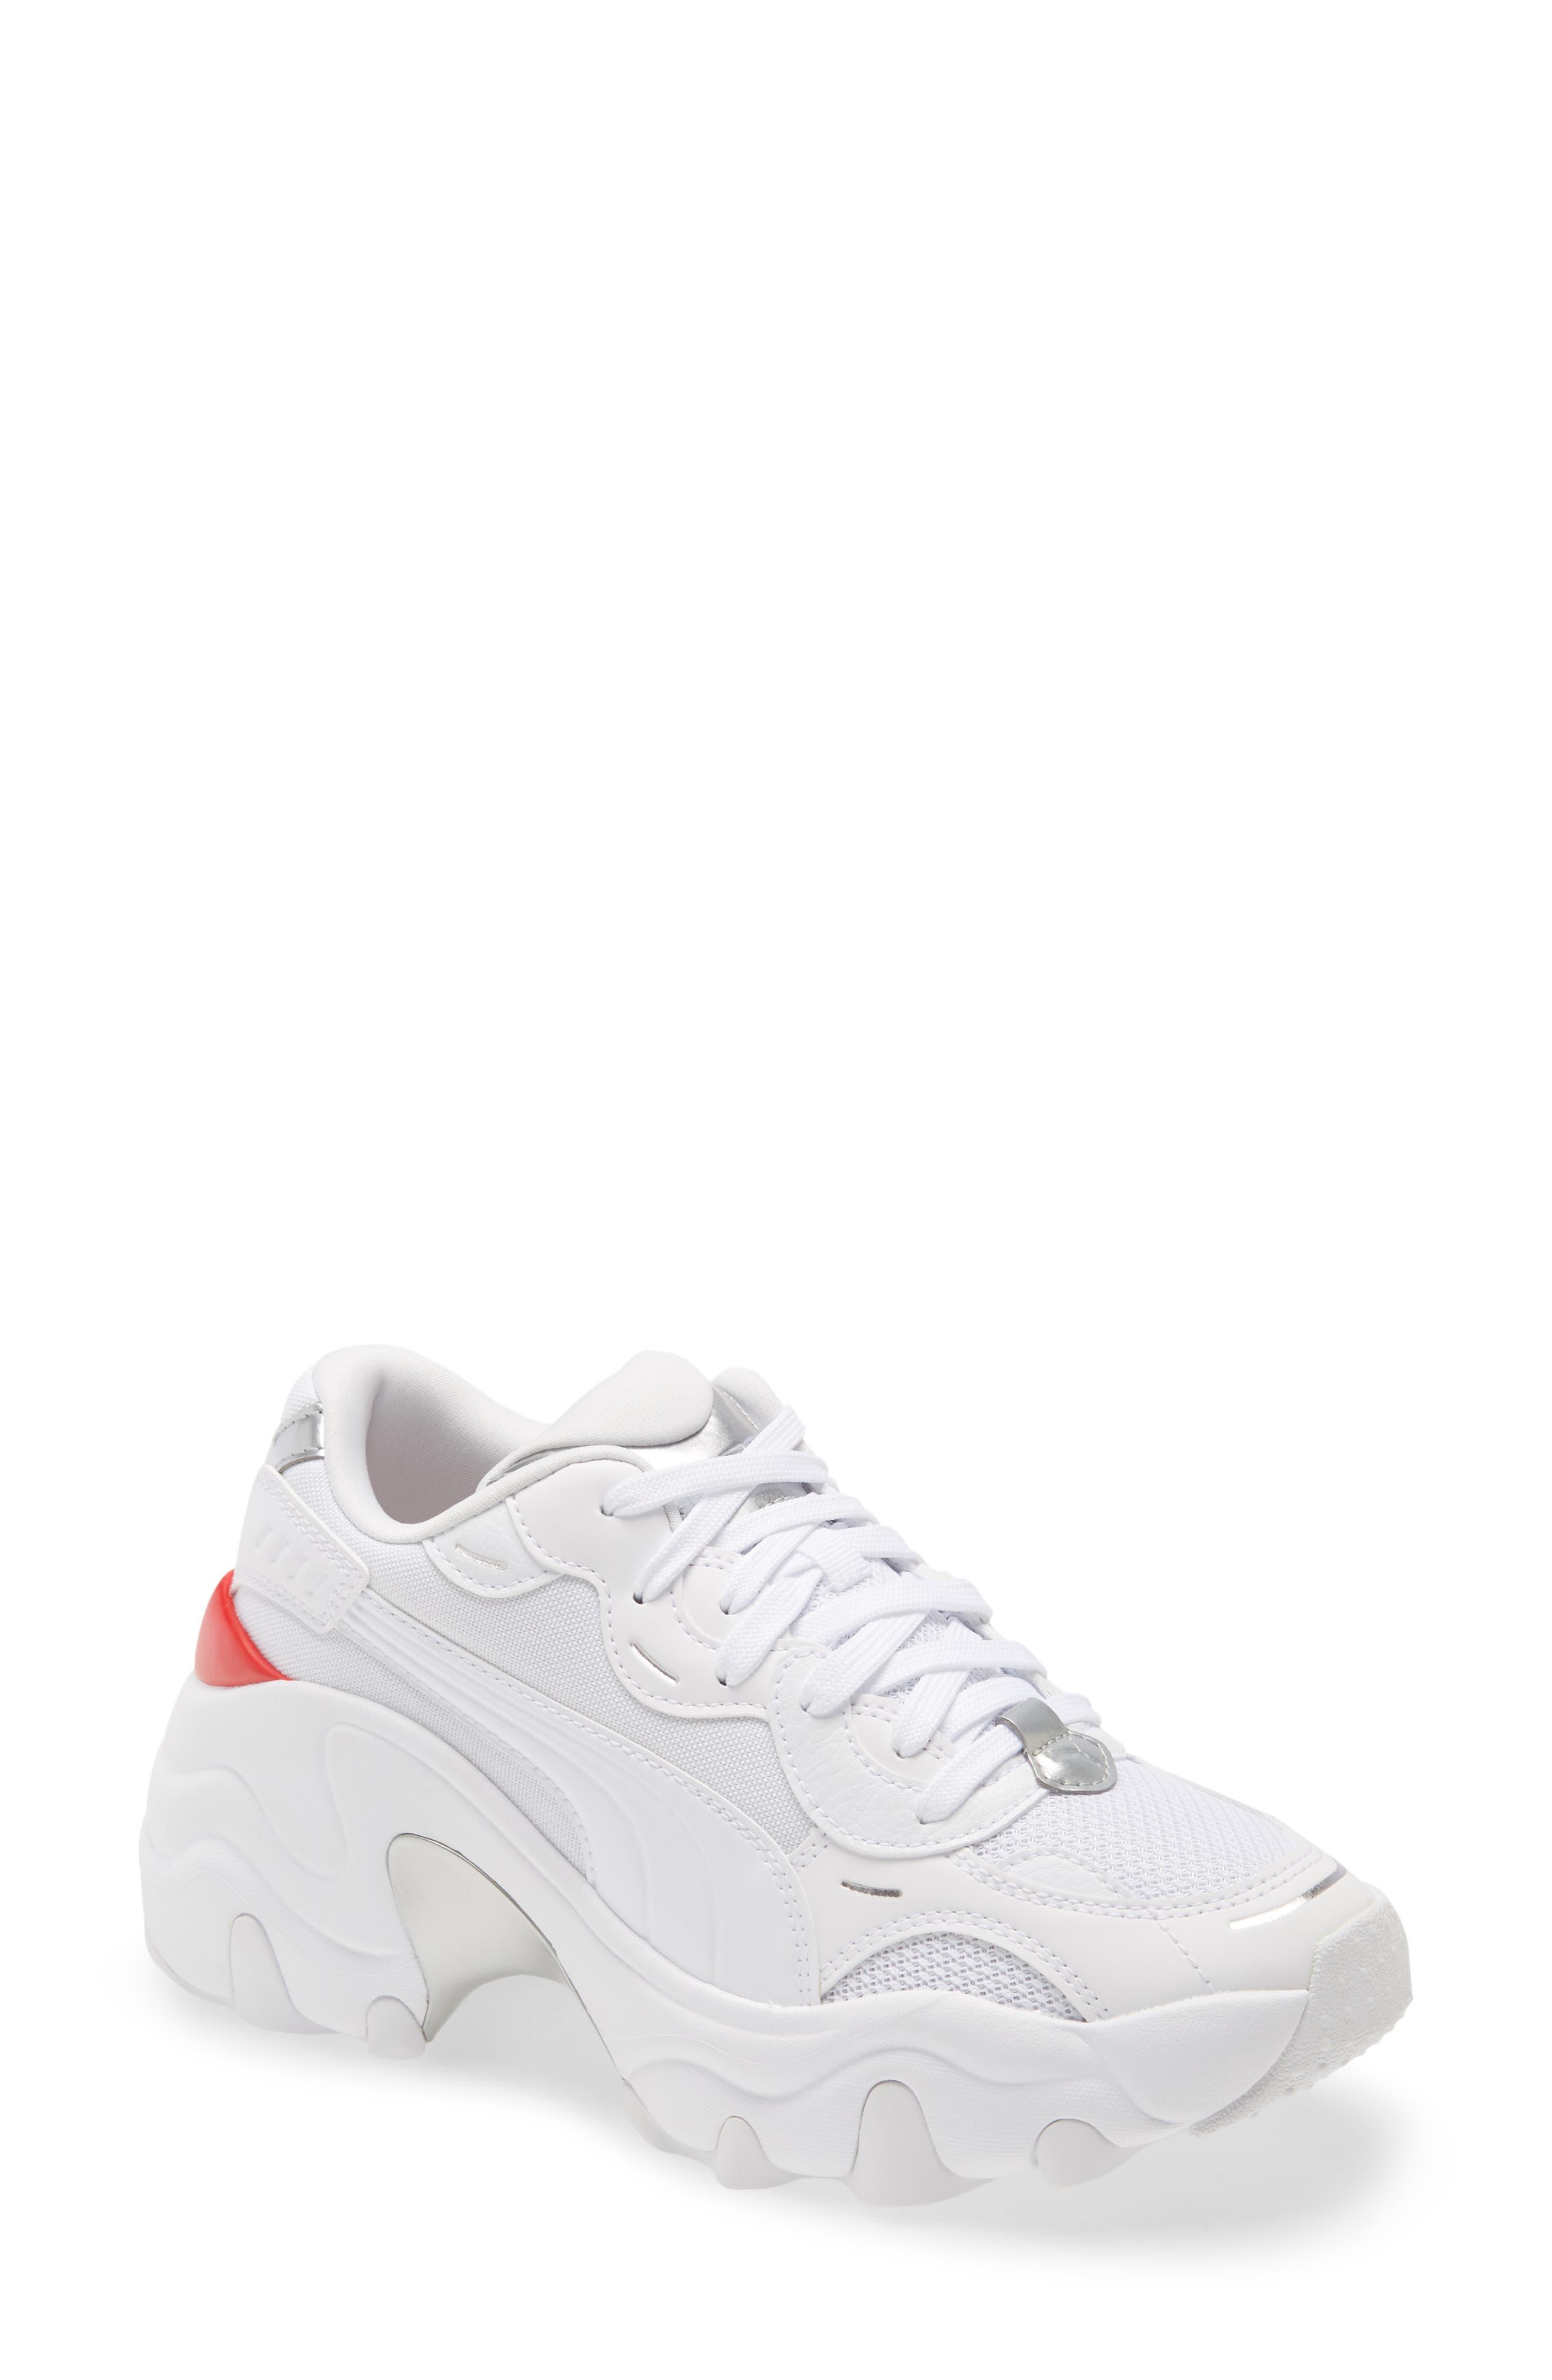 Image of PUMA Pulsar Wedge Tech Glam Sneaker